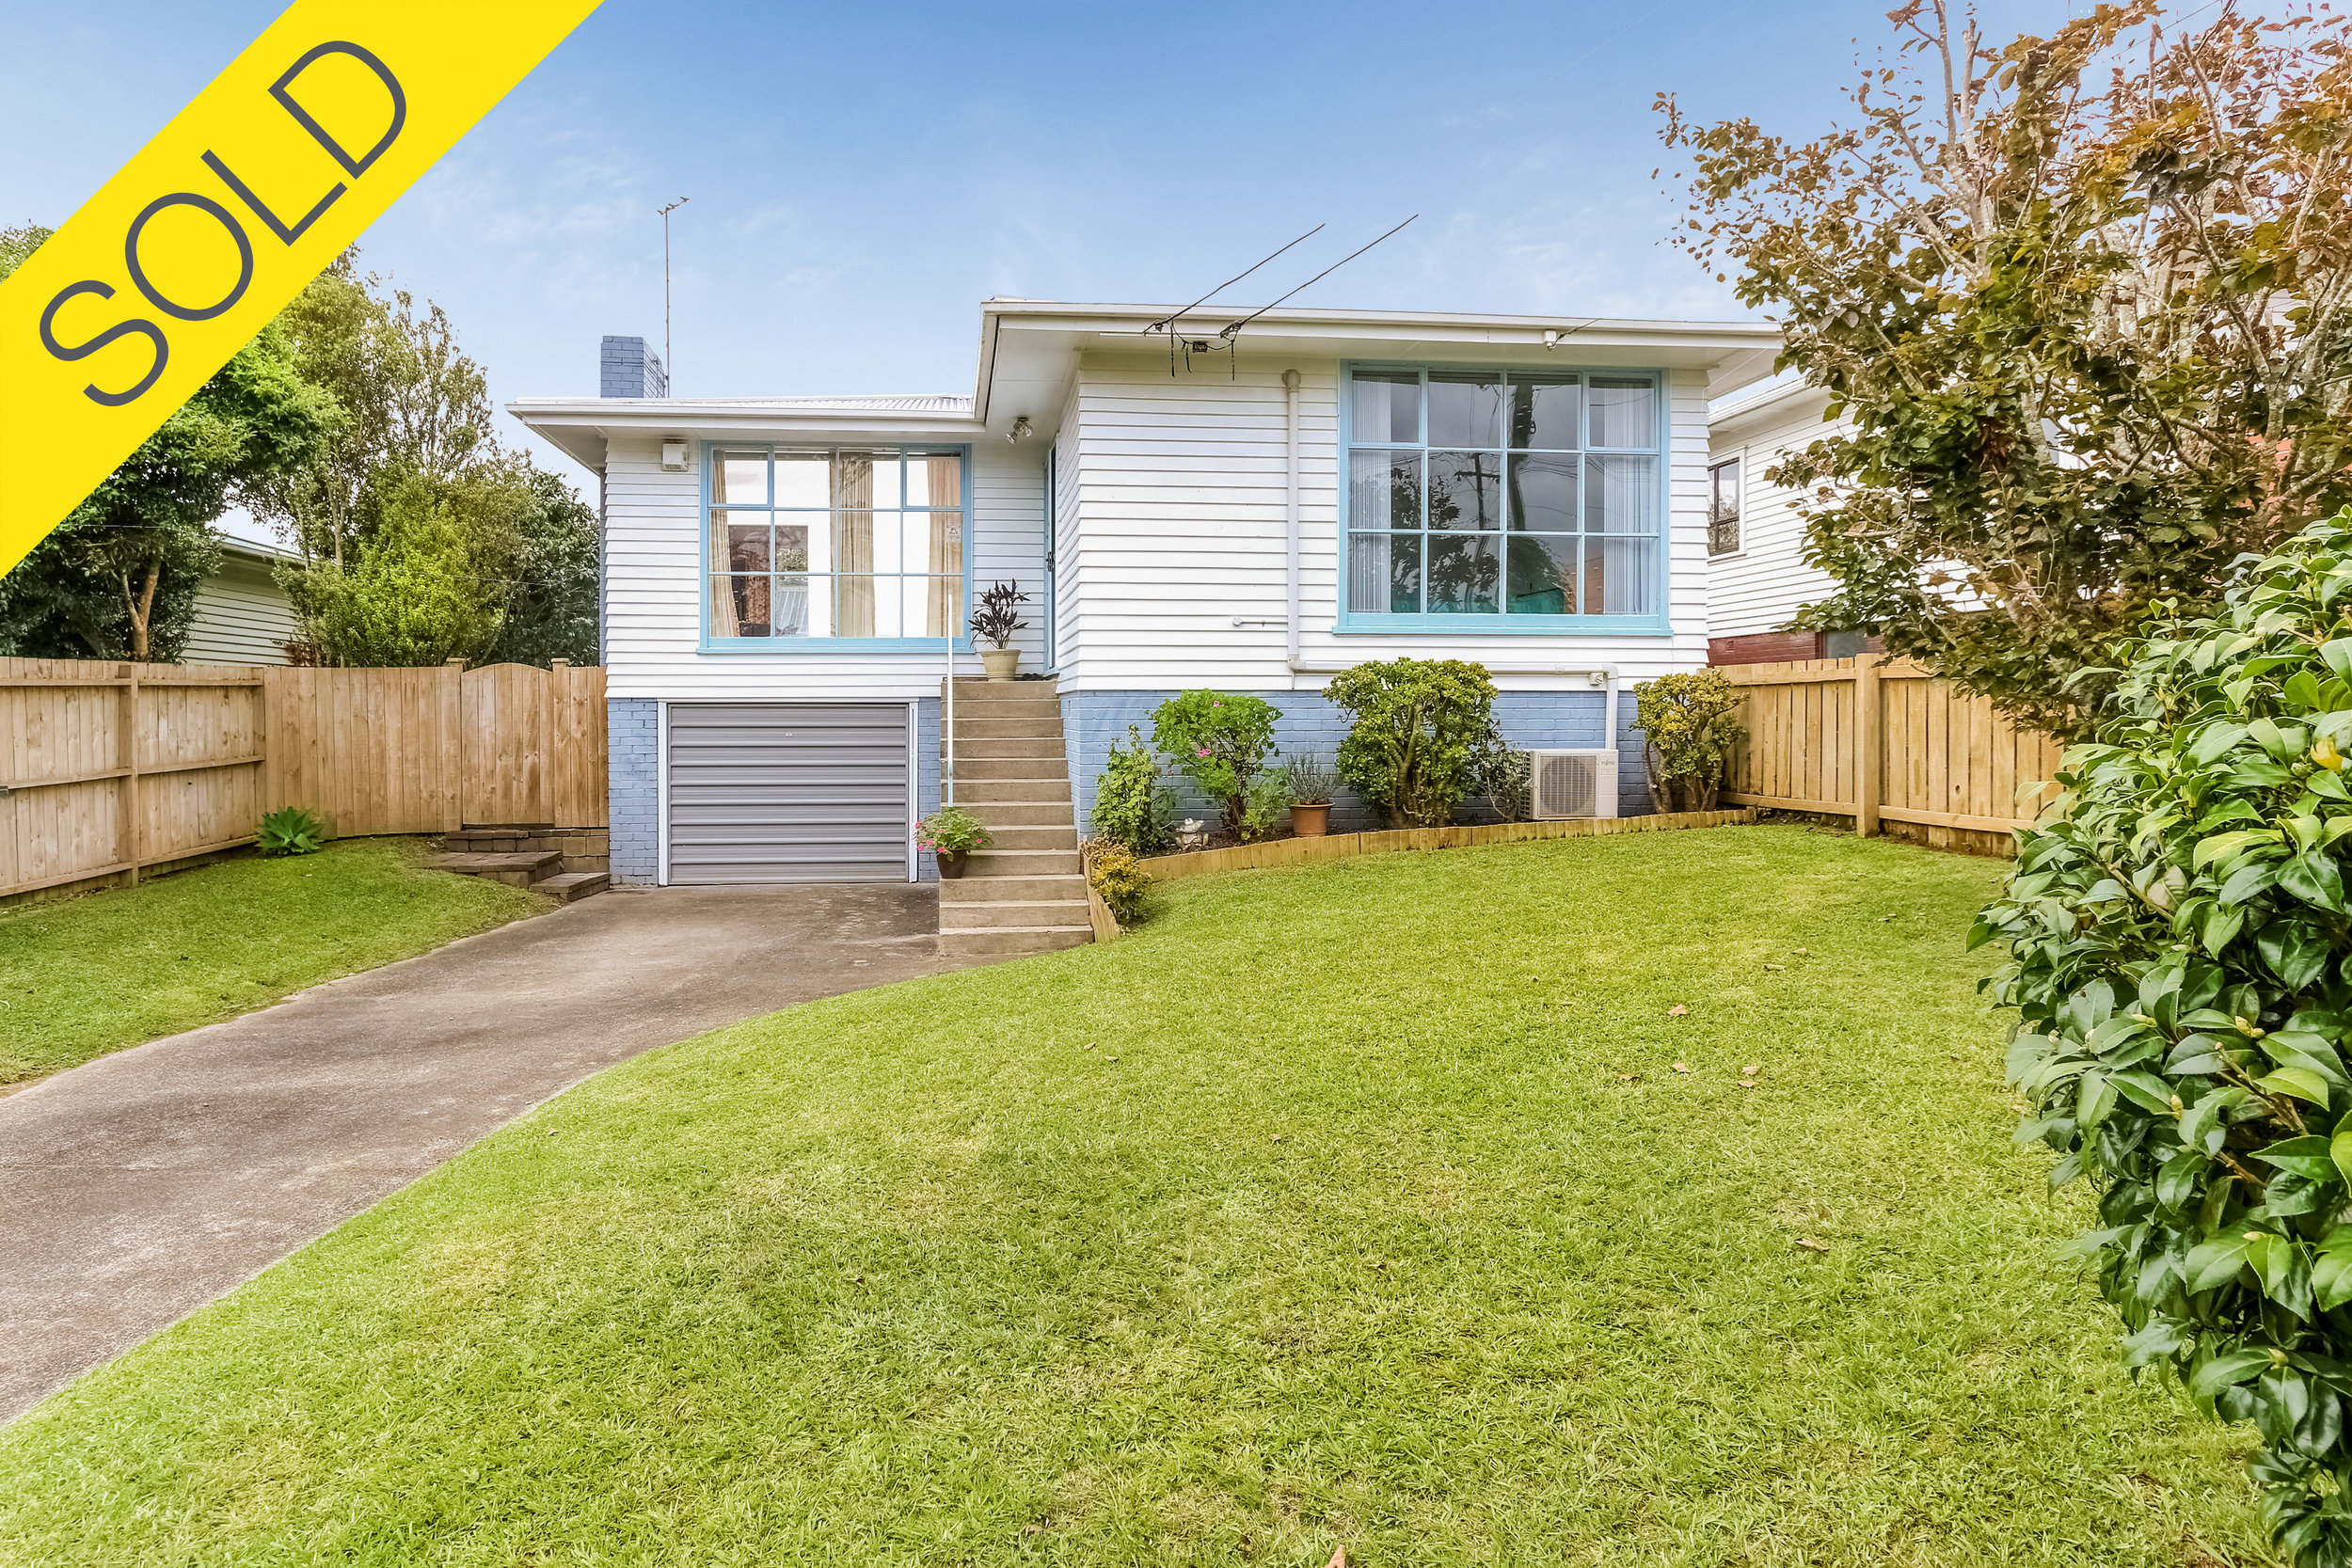 13 Linden Street, Mt Roskill, Auckland - SOLD MAY 20172 Beds I 1 Bath I 3 Parking